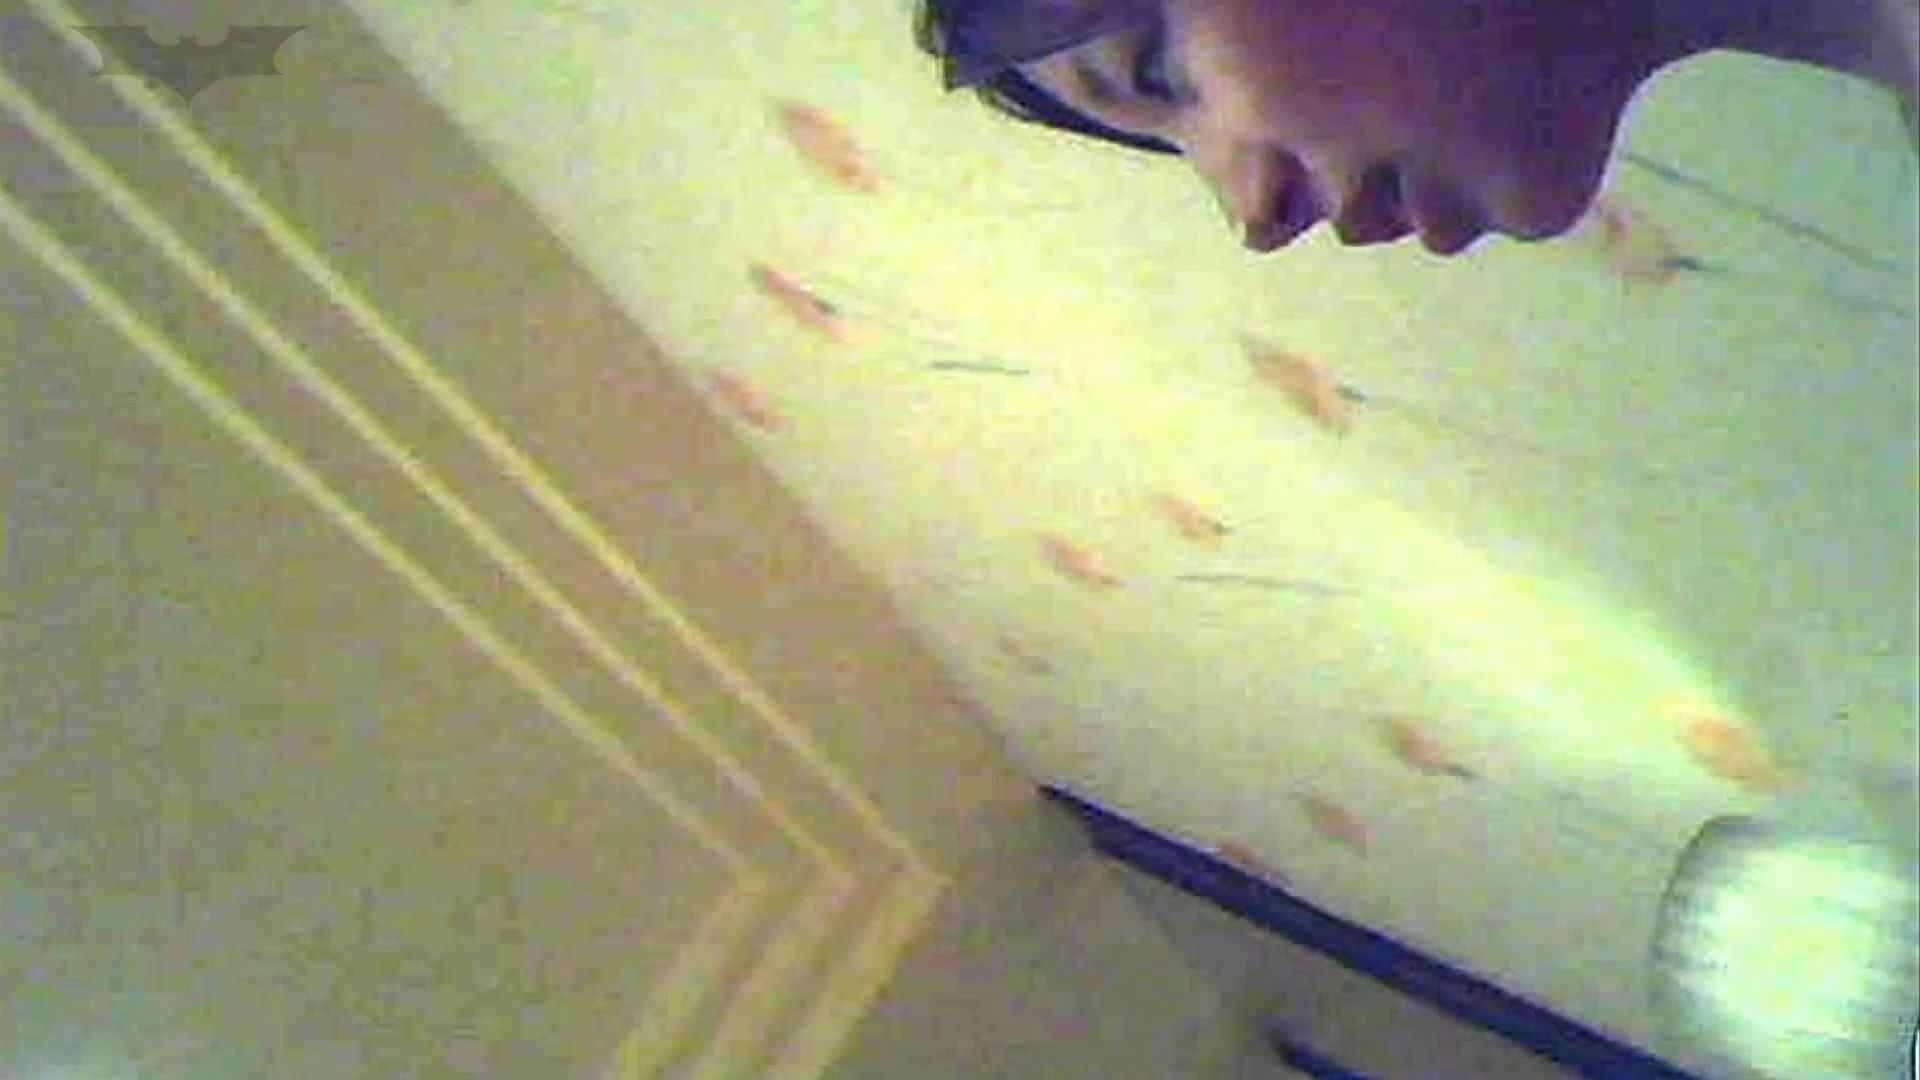 ▲2017_05位▲ 学園アイドル美人女子大生!❶4人厳選詰合せVol.49 人気作   女子大生  113画像 2